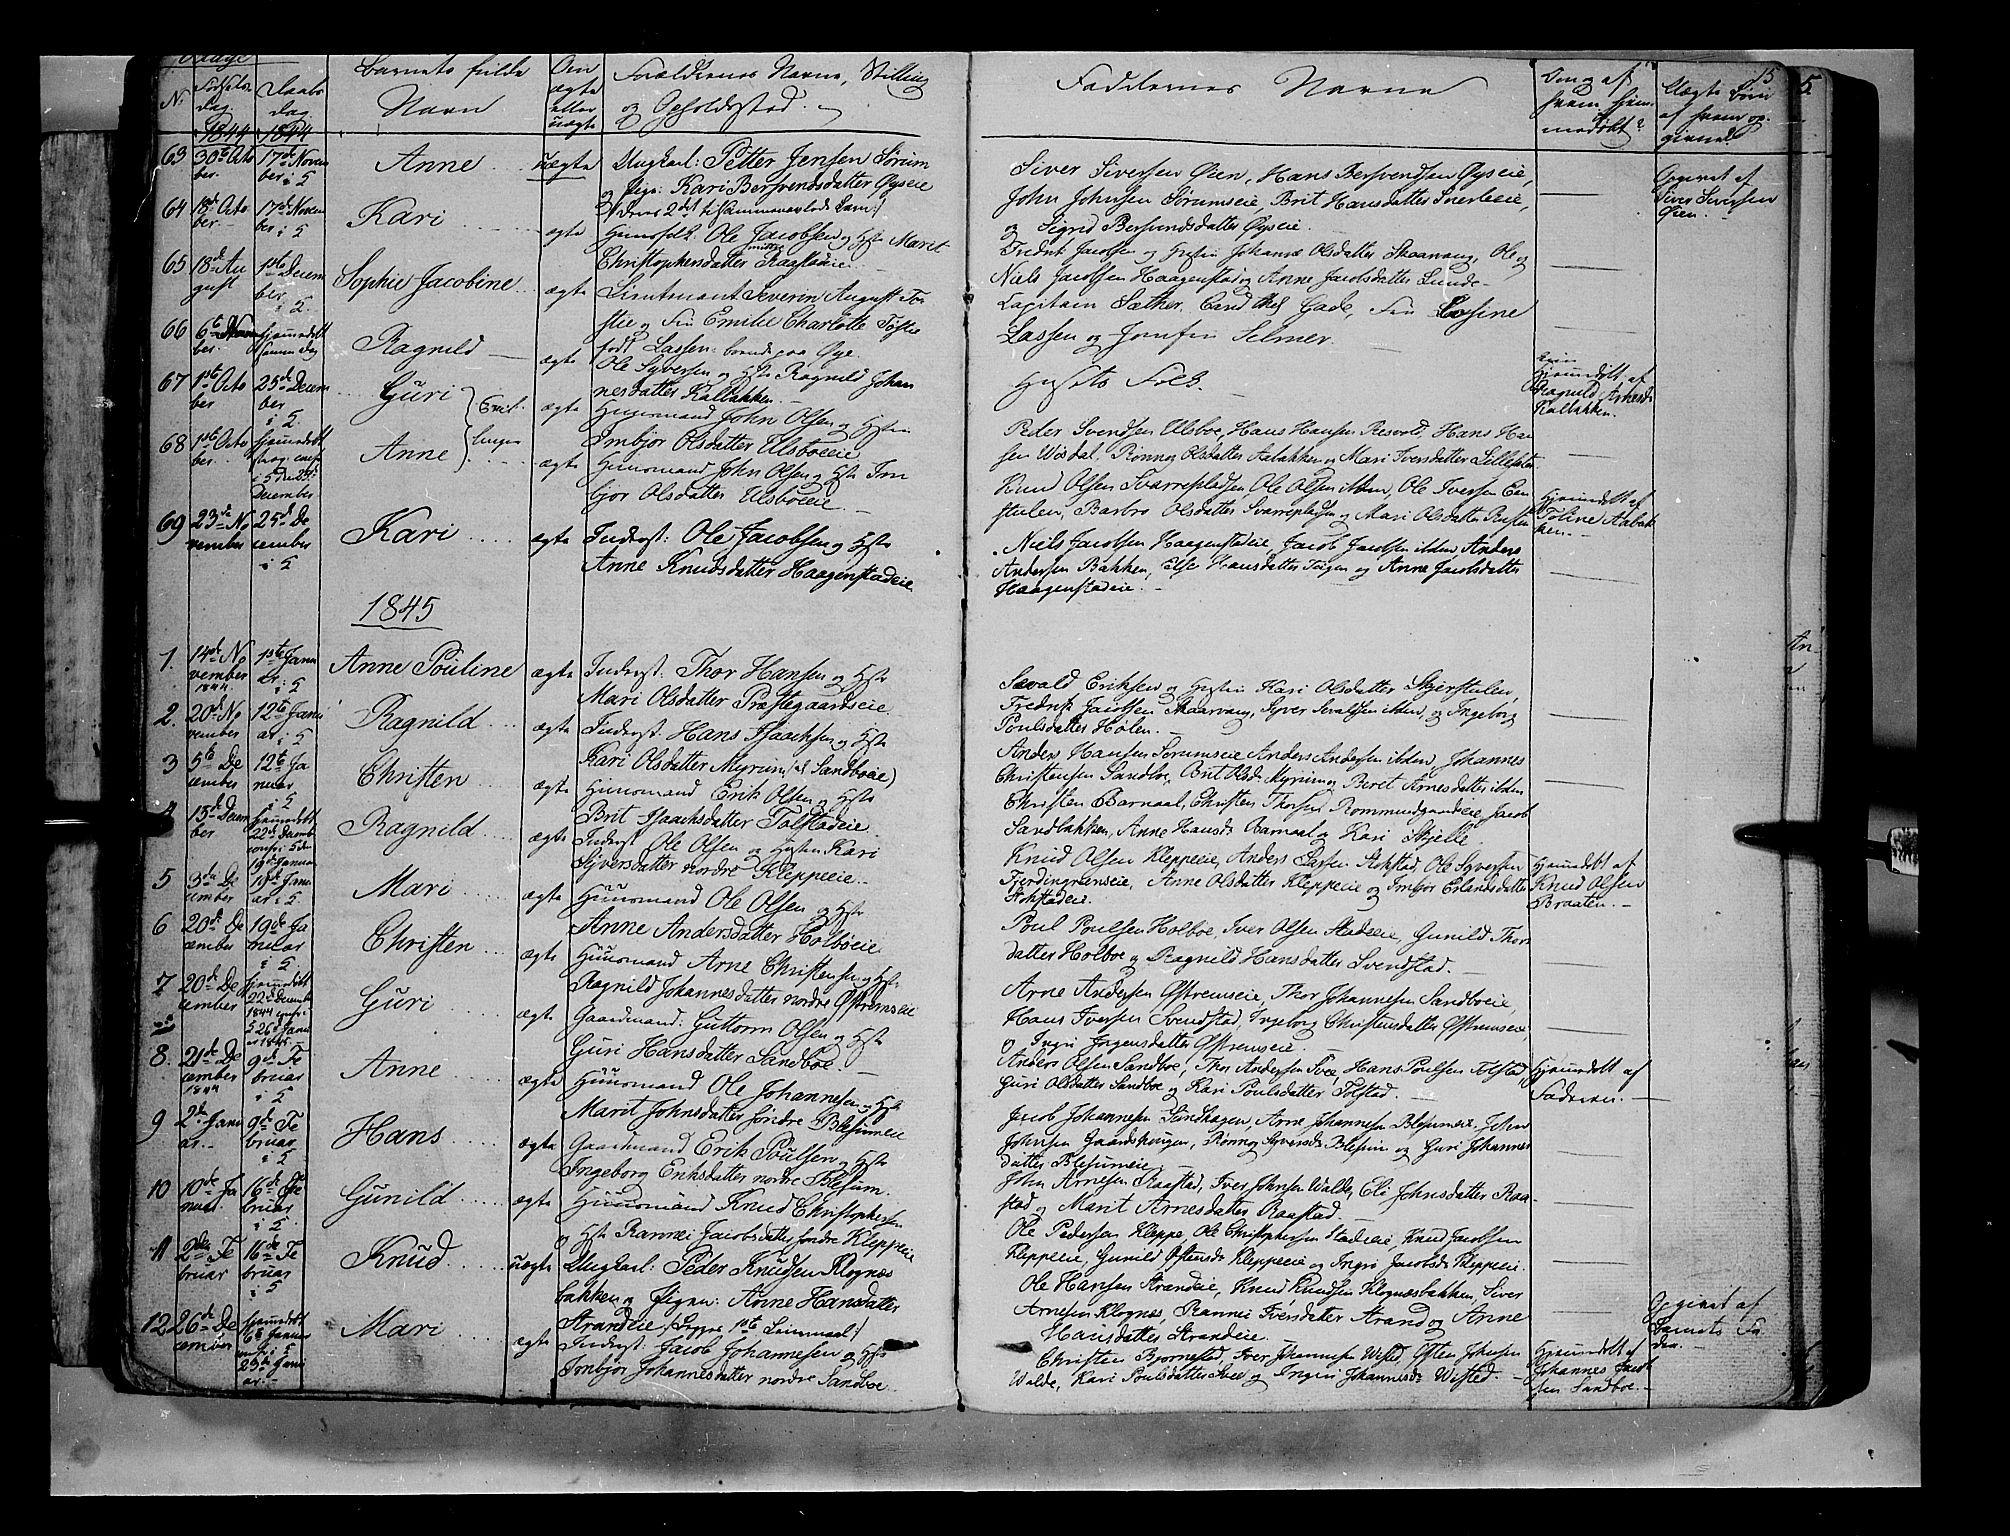 SAH, Vågå prestekontor, Ministerialbok nr. 5 /1, 1842-1856, s. 15